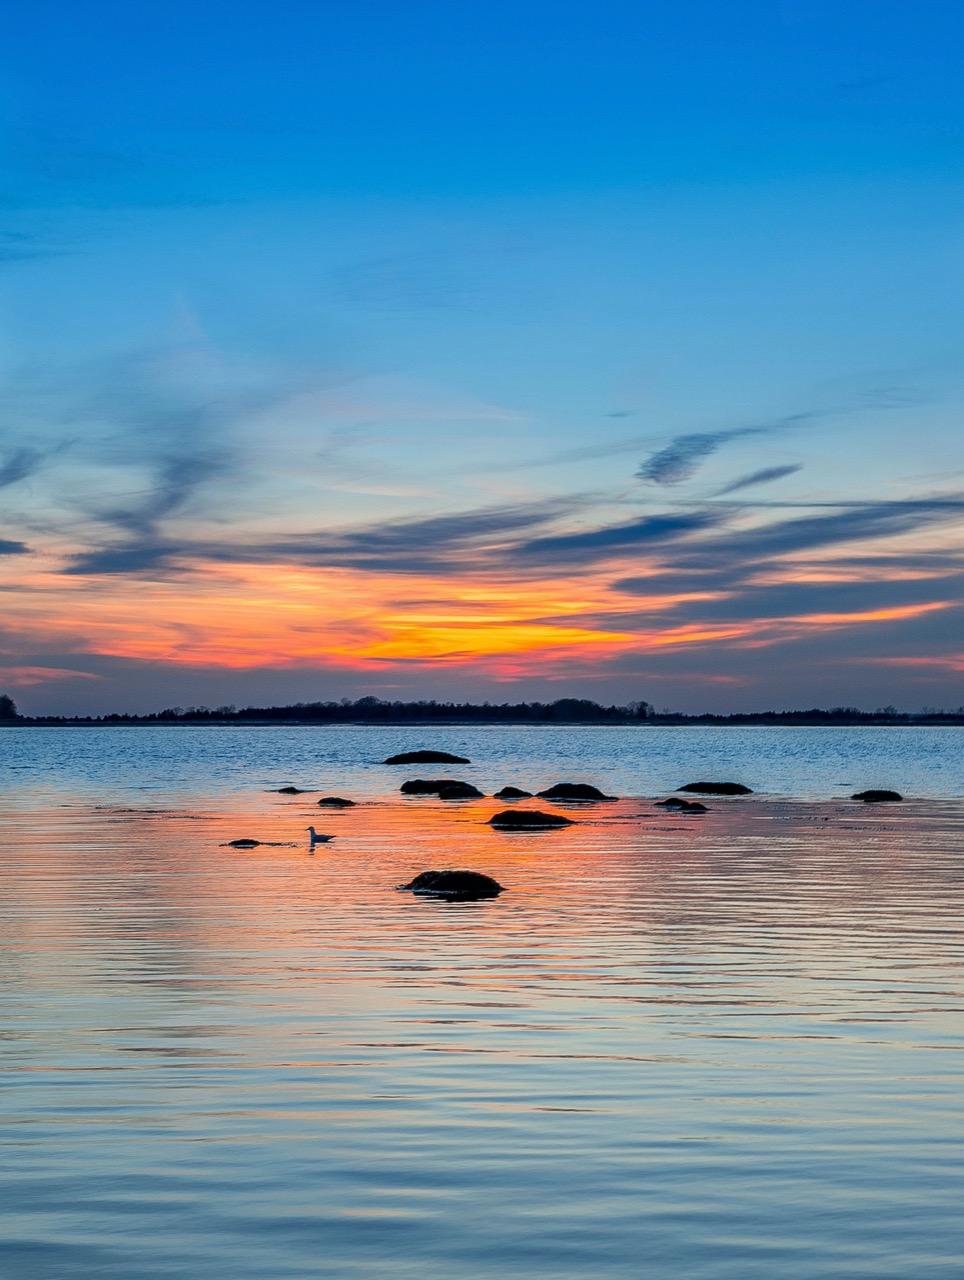 Shoreline in Connecticut